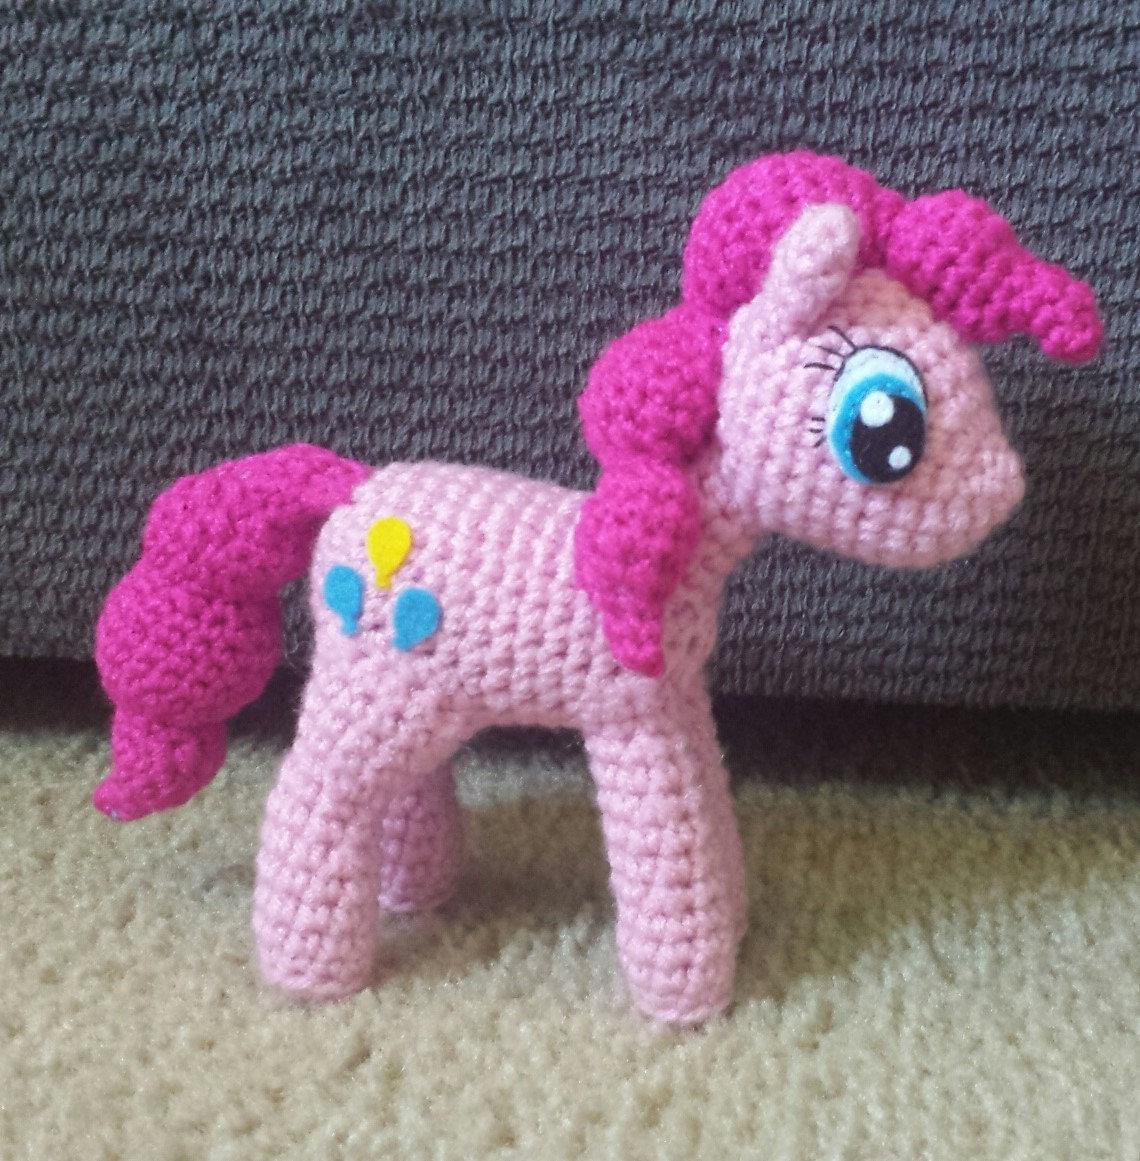 My Little Pony Crochet Pattern Picsbud